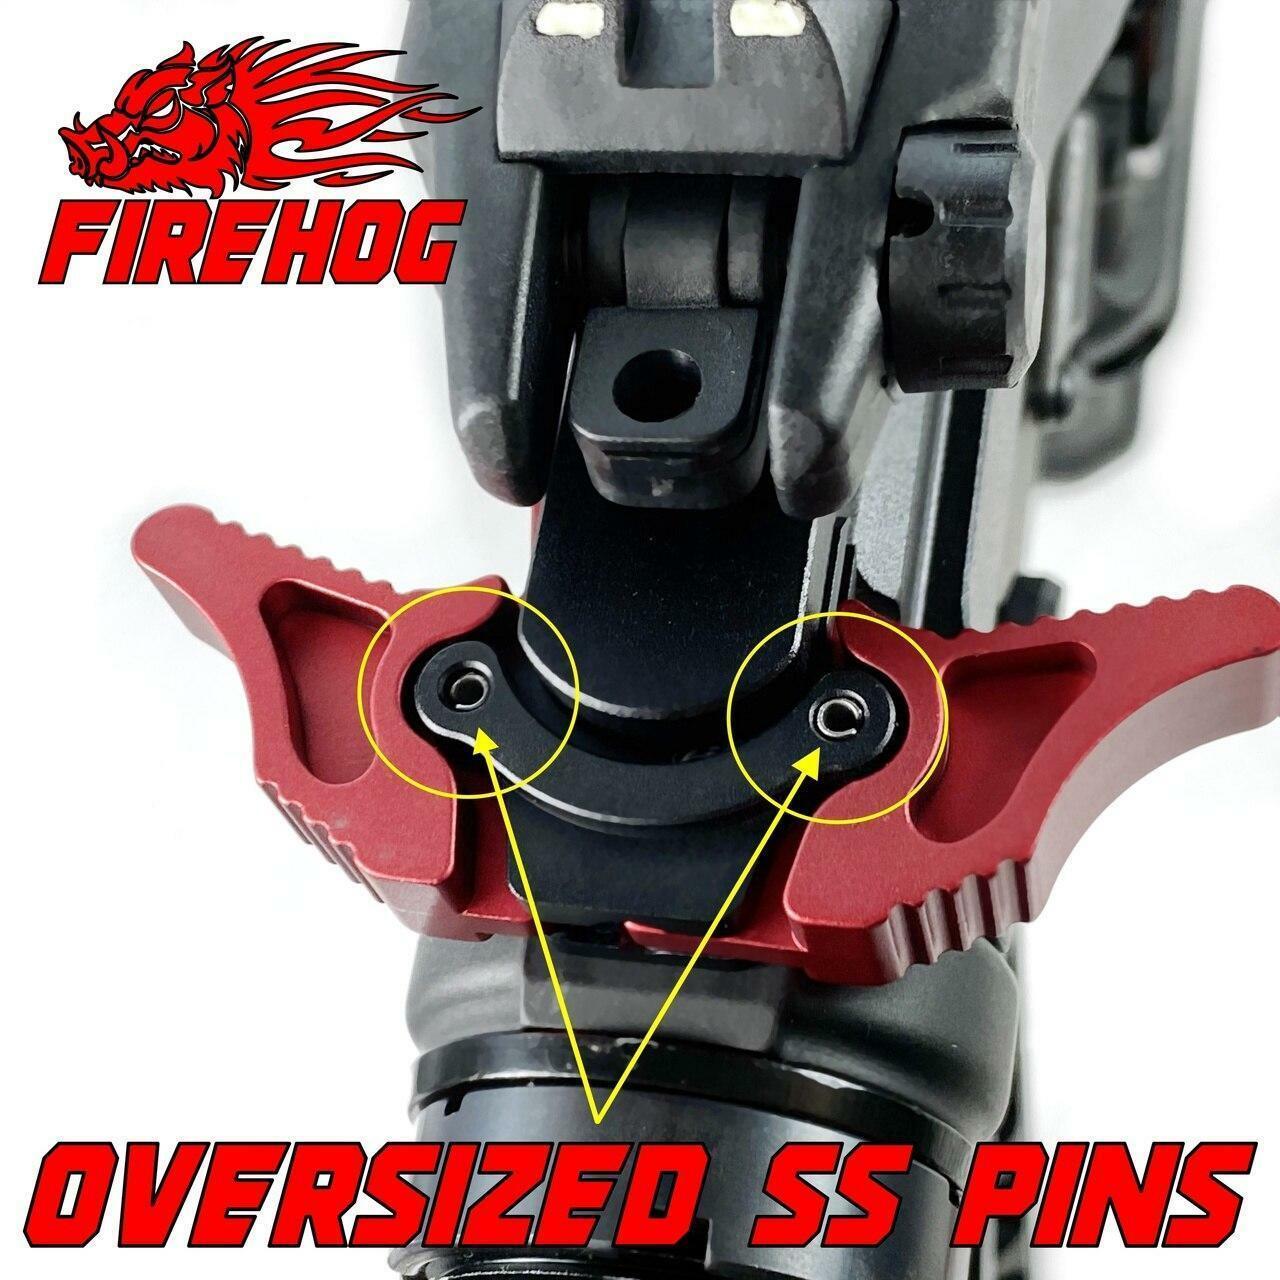 FIREHOG FireHog MOD-GEM4 Ambi Charging Handle with Gas Exhaust Mitigation or RED AR-10 LR.308